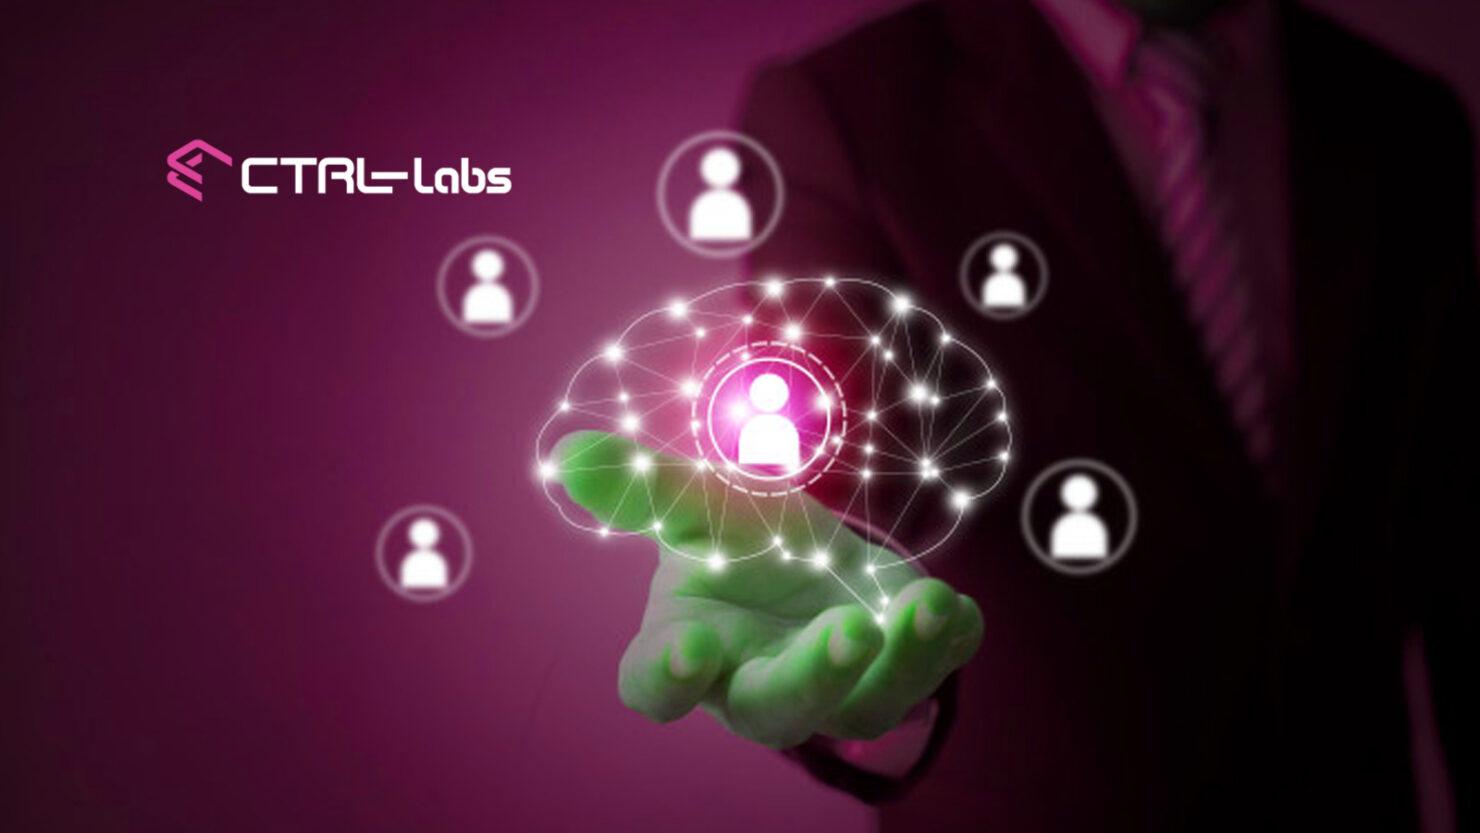 CTRL-Labs Facebook